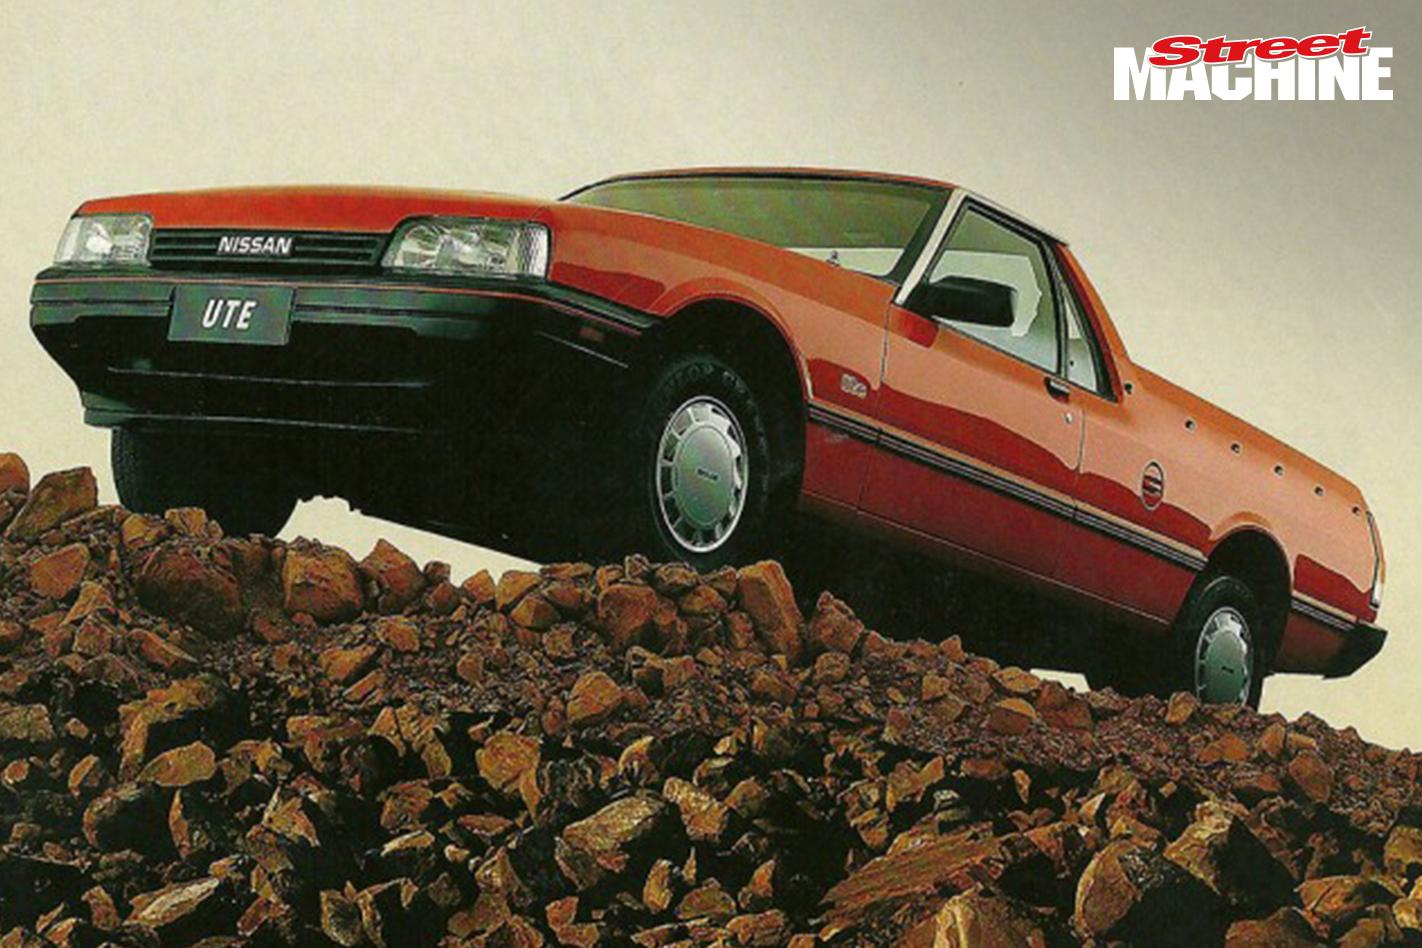 Nissan Ute